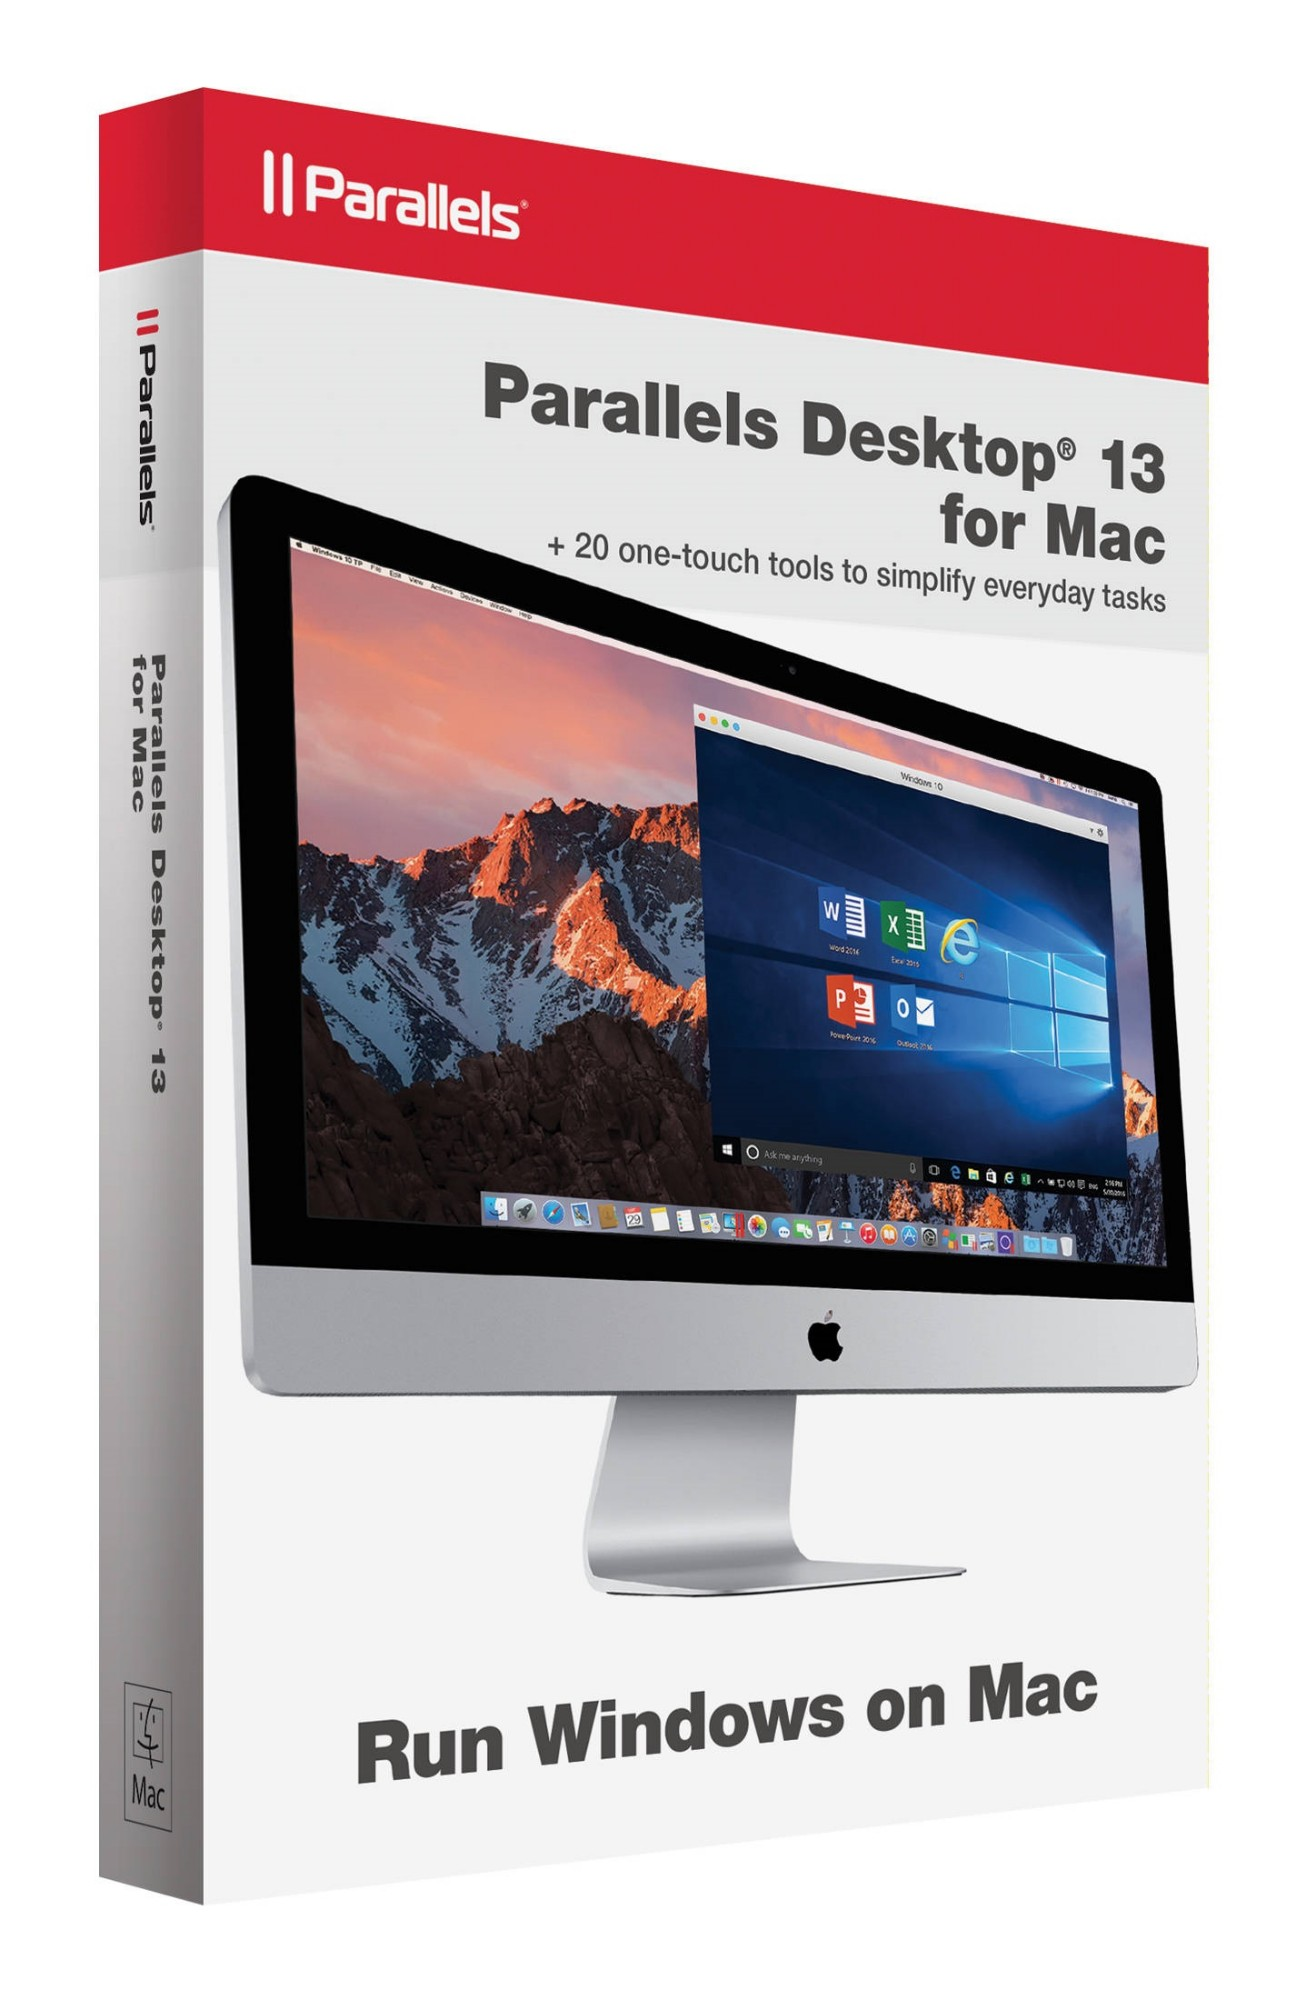 Parallels PDFM13L-BX1-NA general utility software